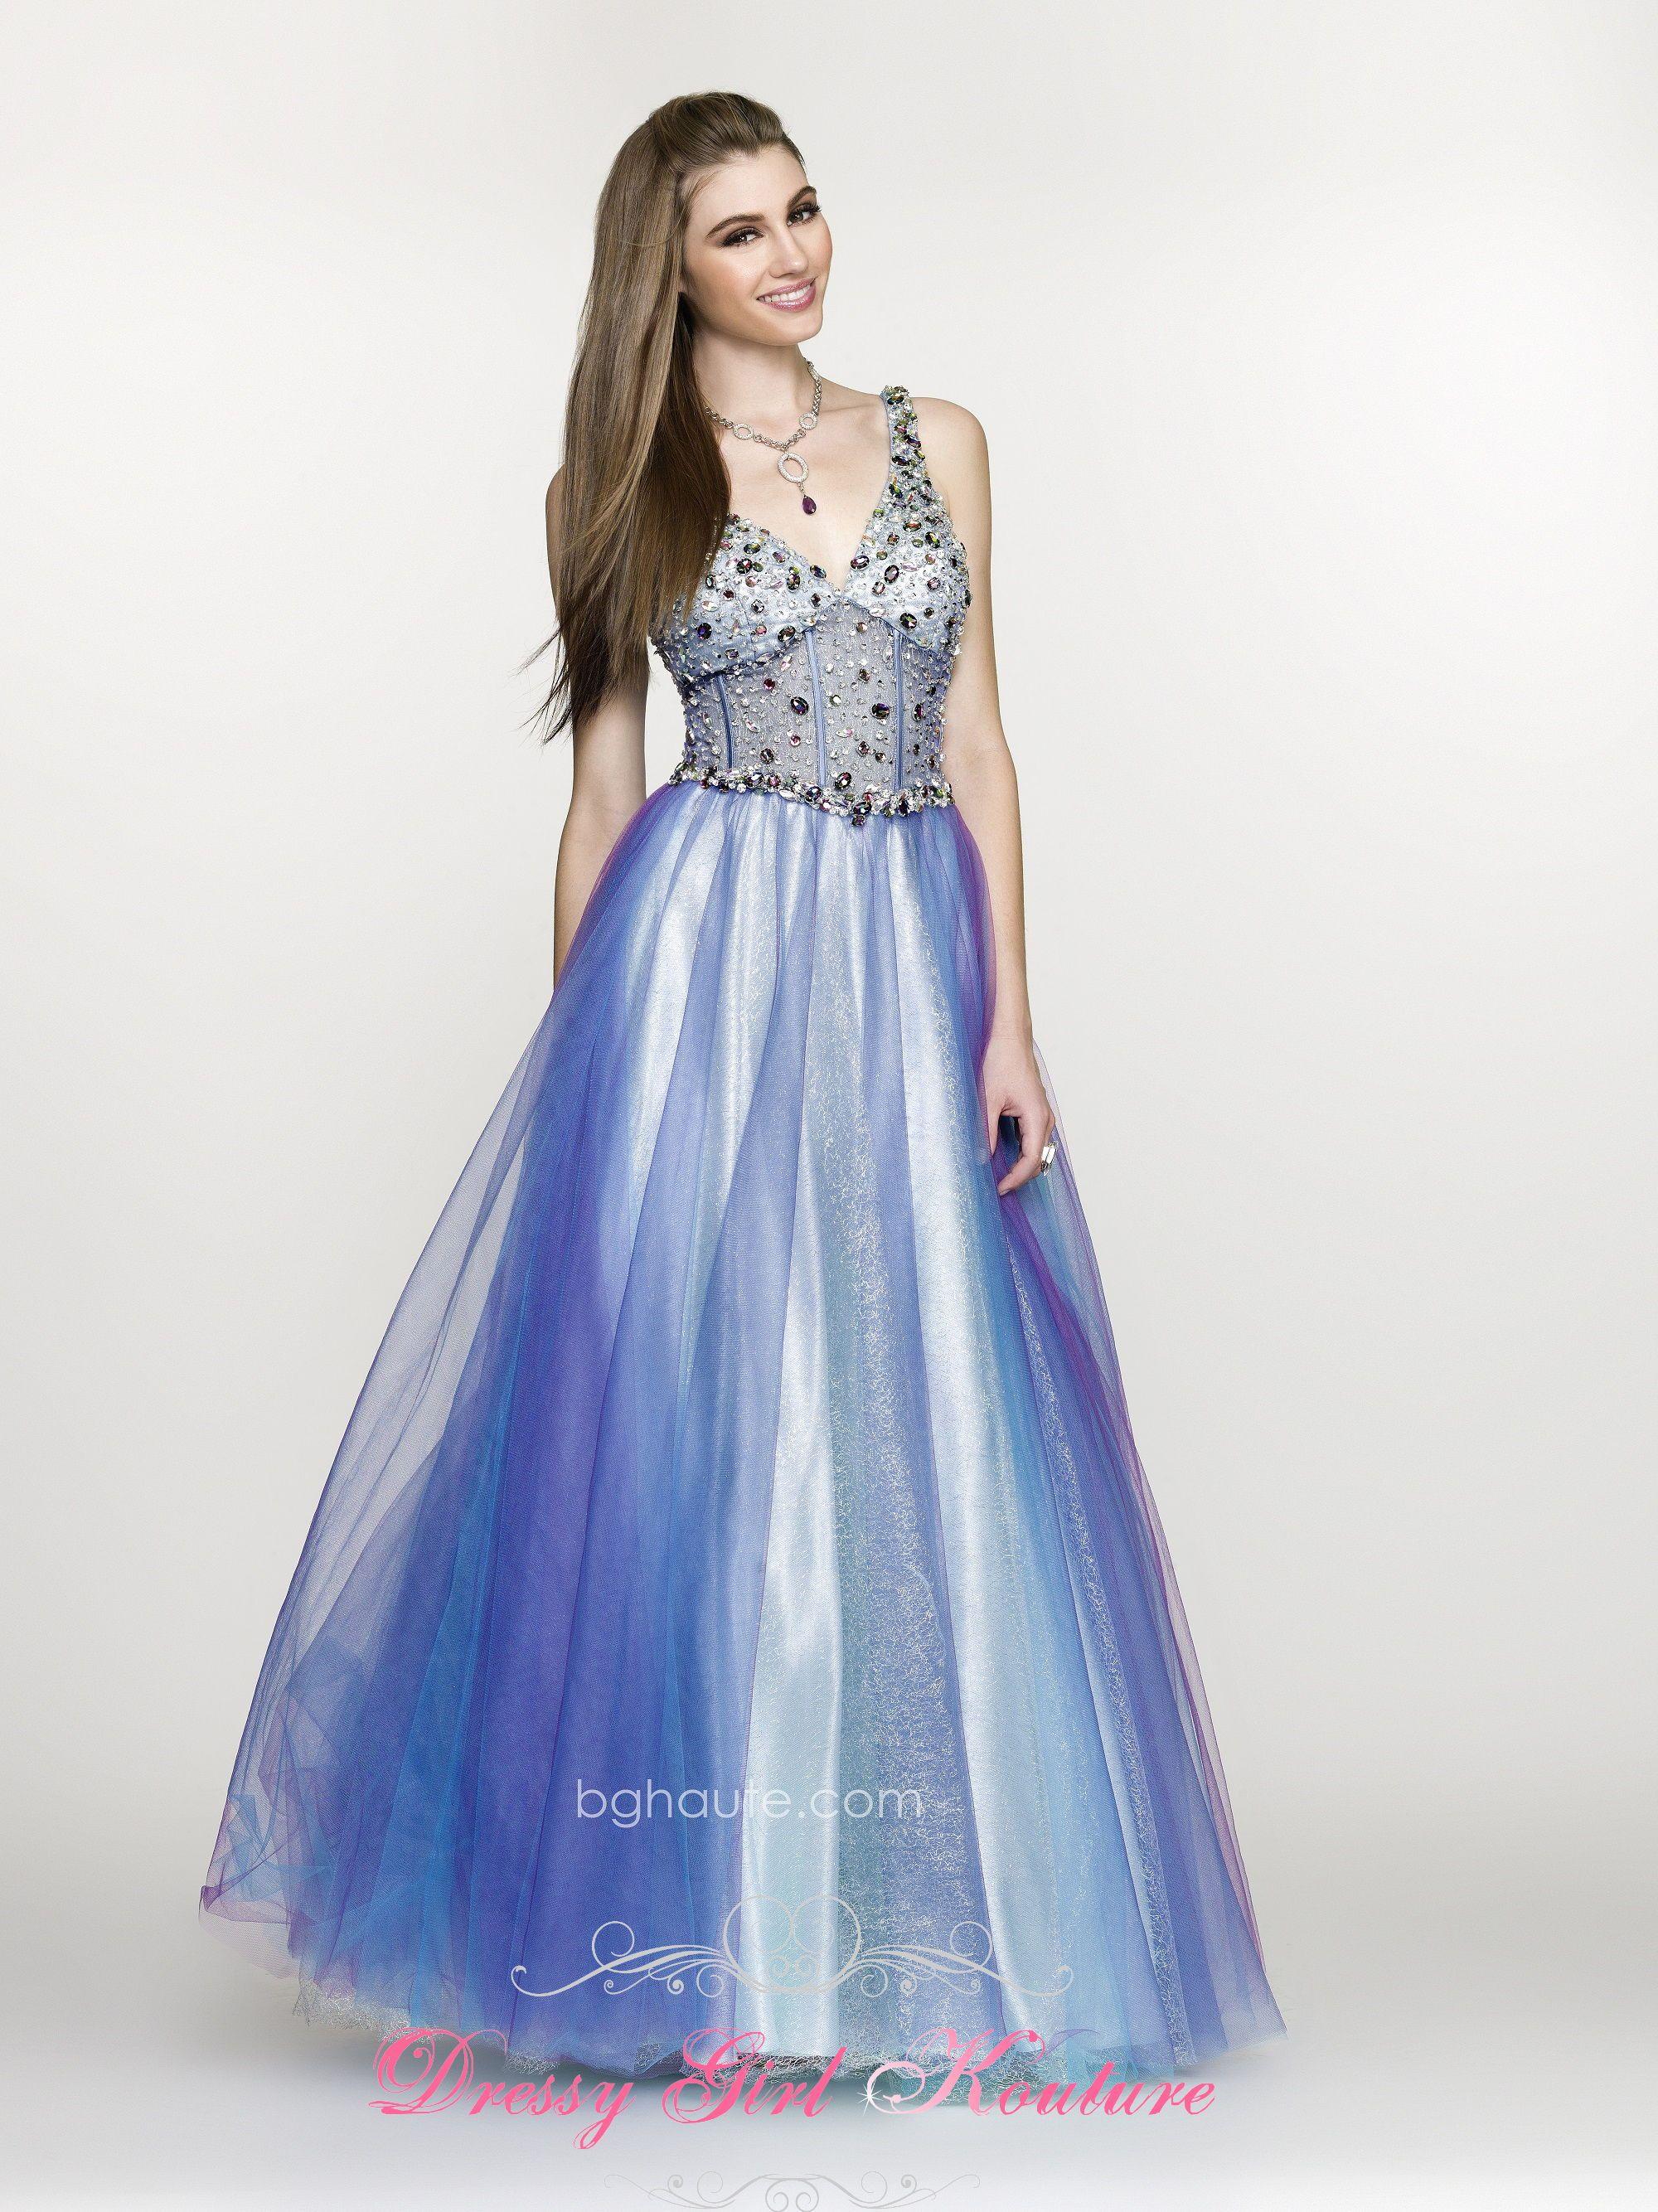 Enchanting Bg Haute Prom Dresses Model - Wedding Dress Ideas ...